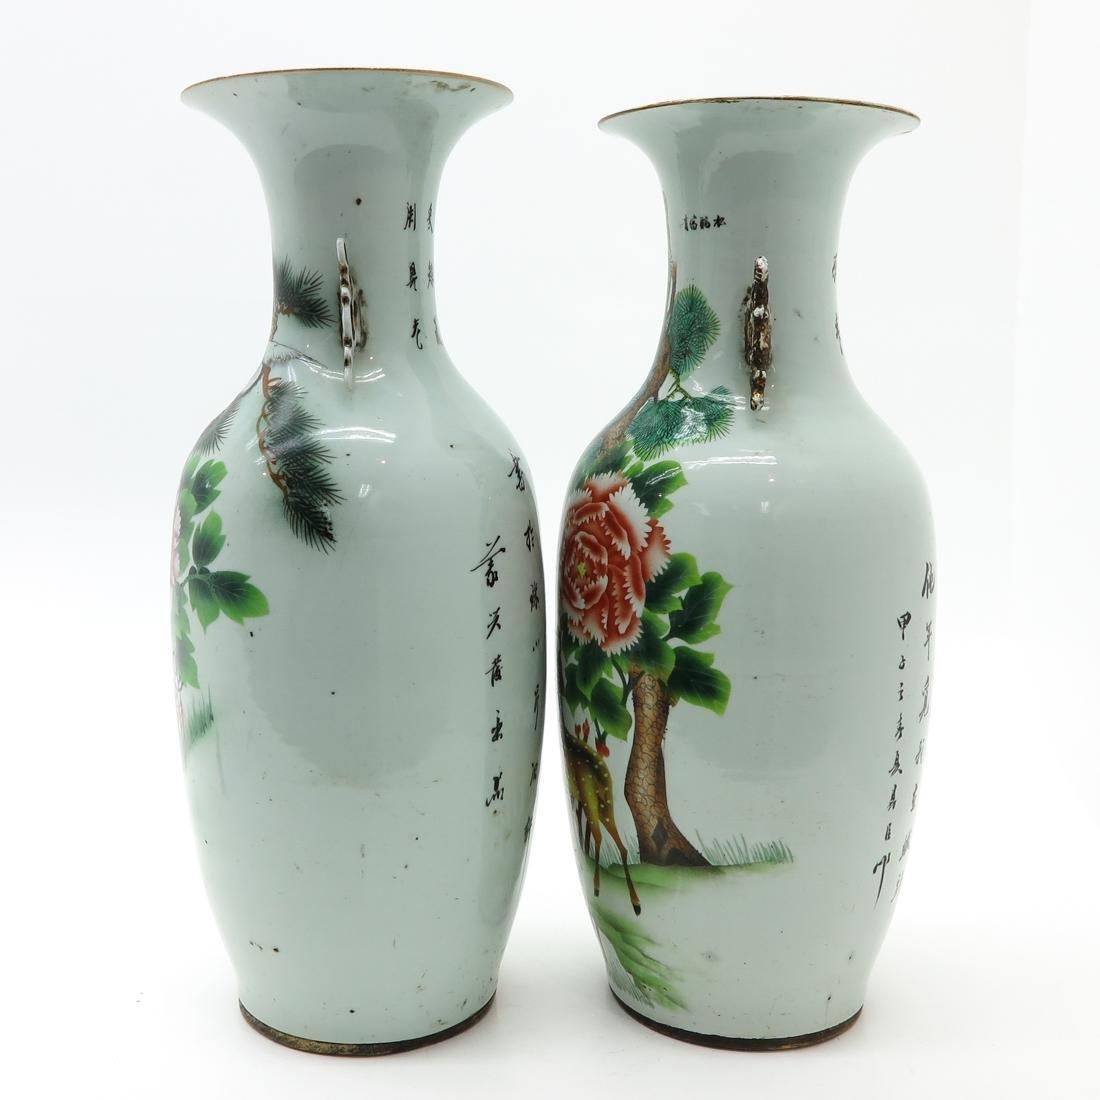 Lot of 2 Vases - 2